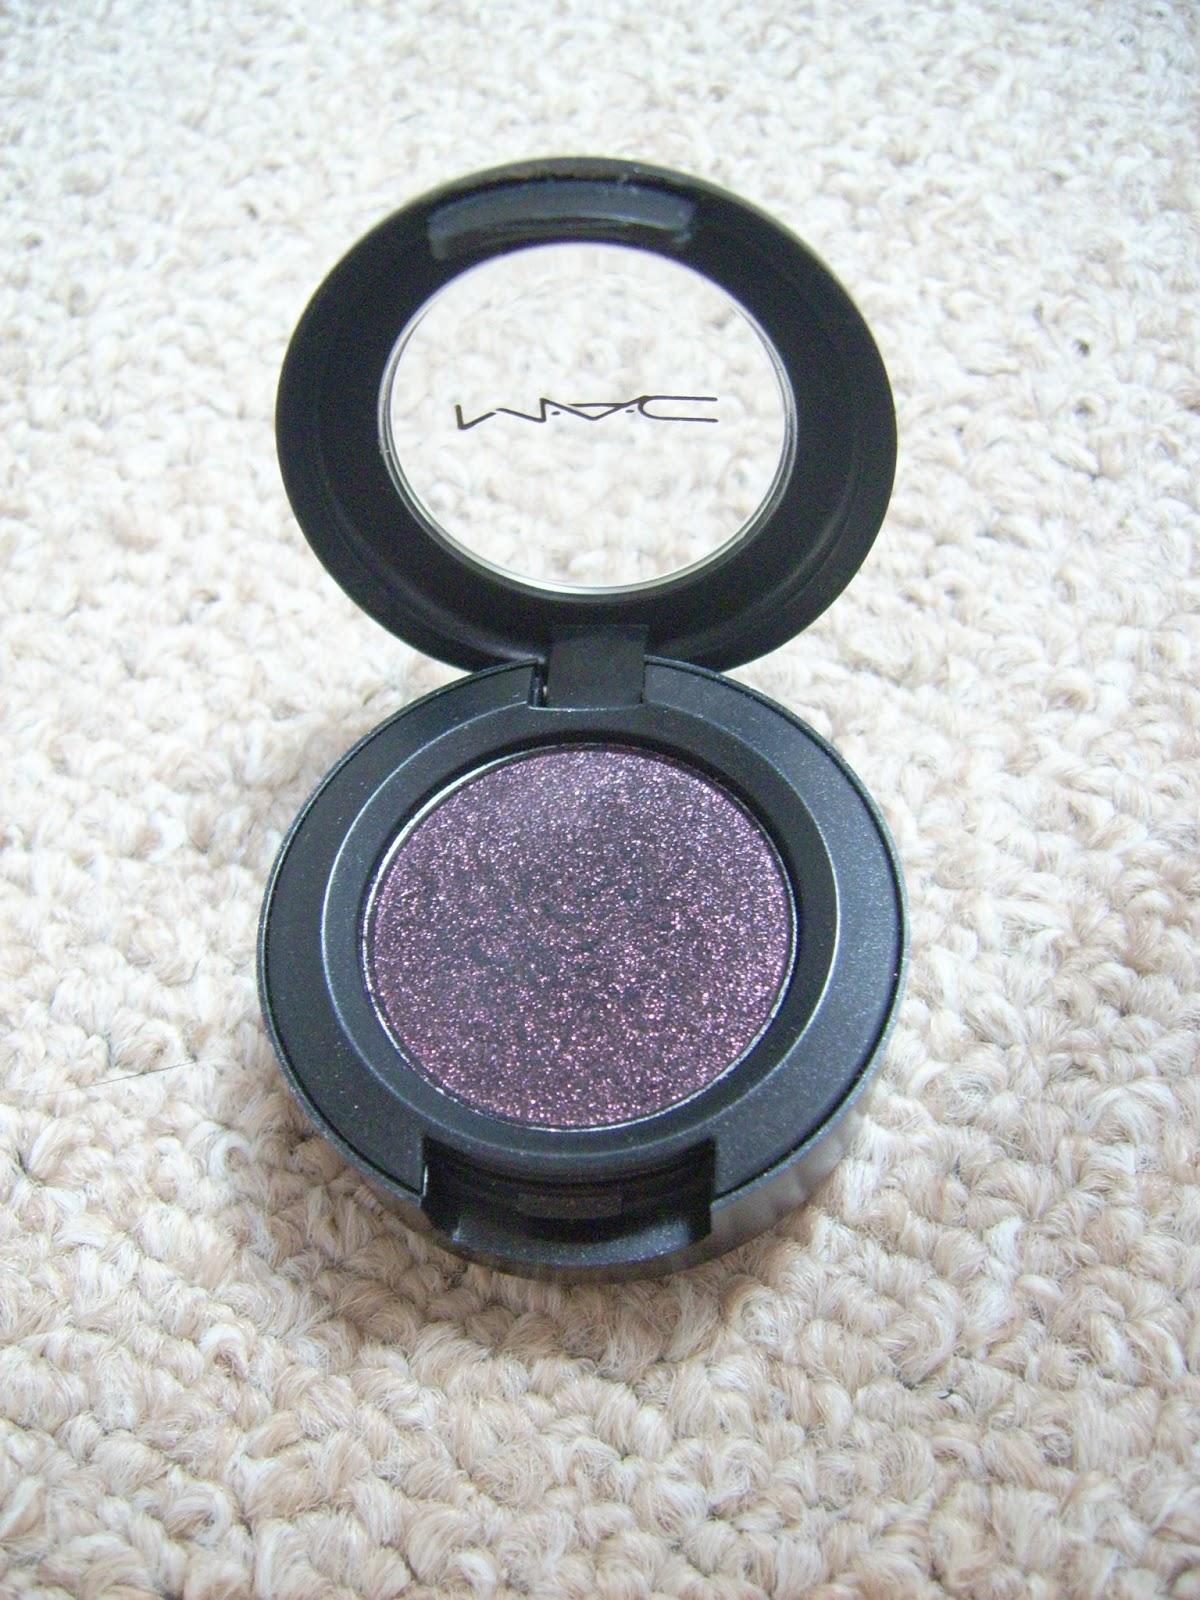 MAC eyeshadows Beauty marked